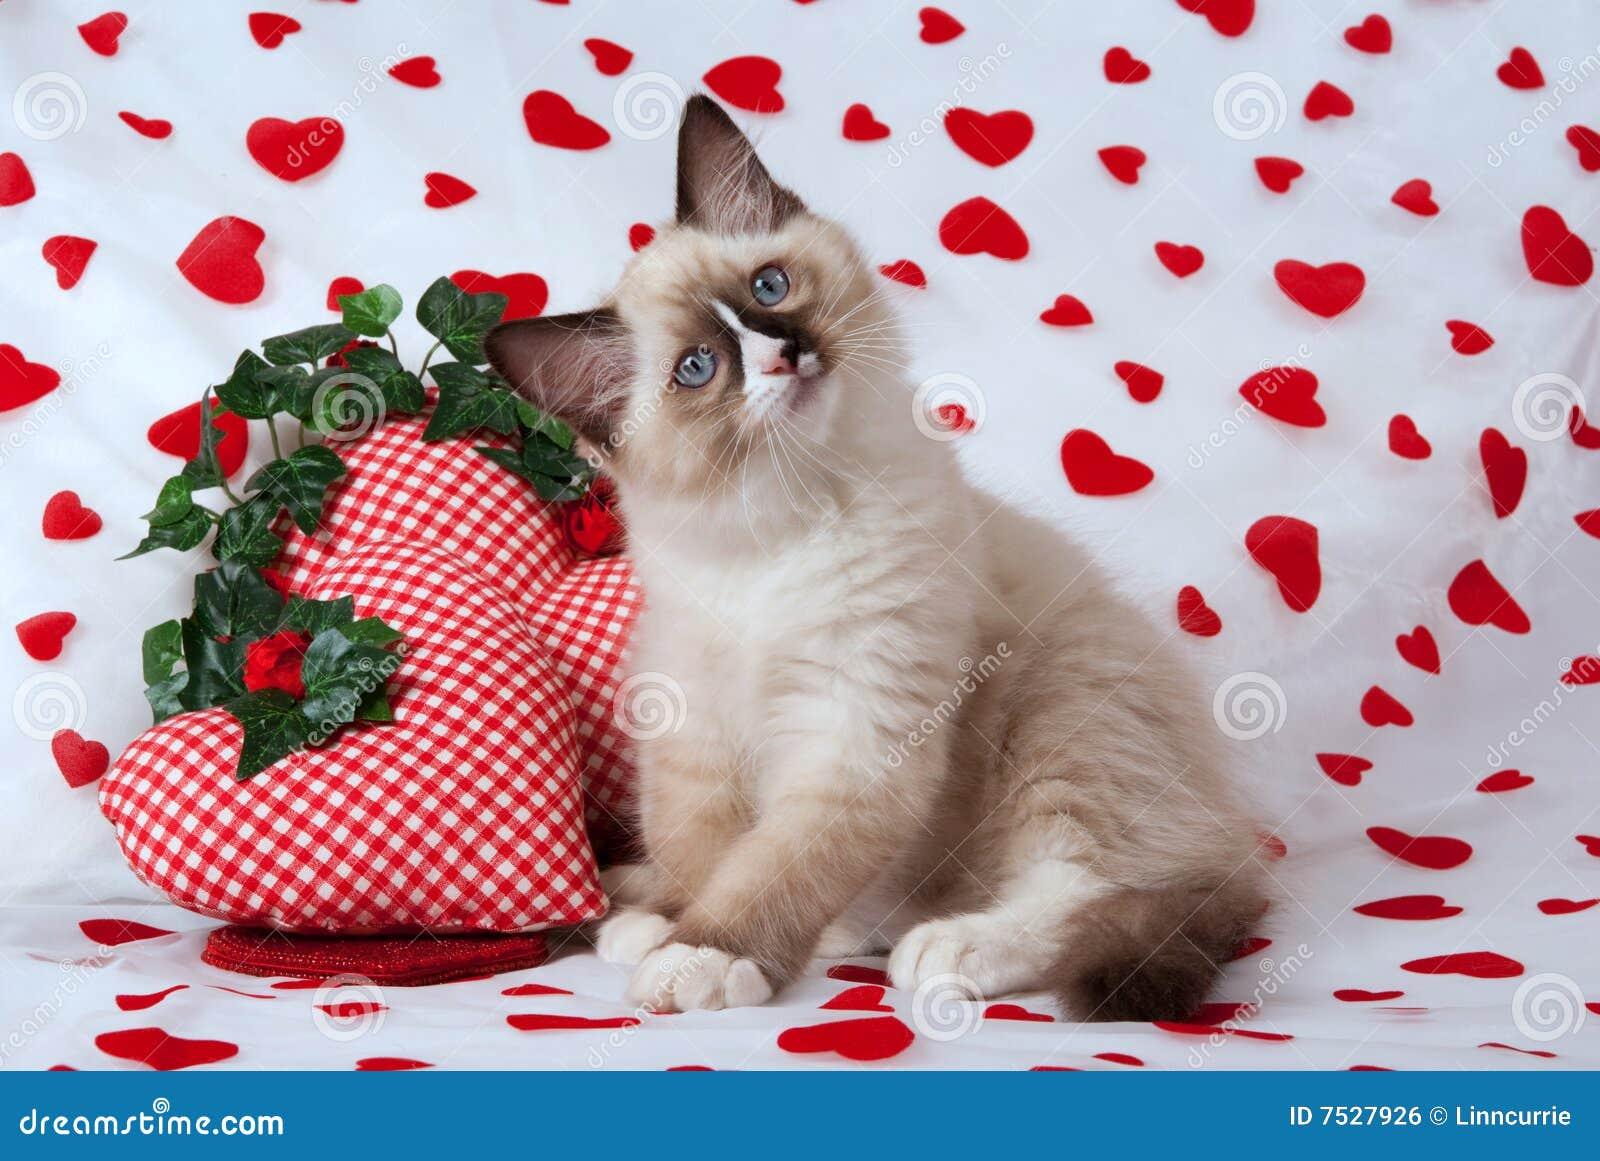 Валентайн темы котенка